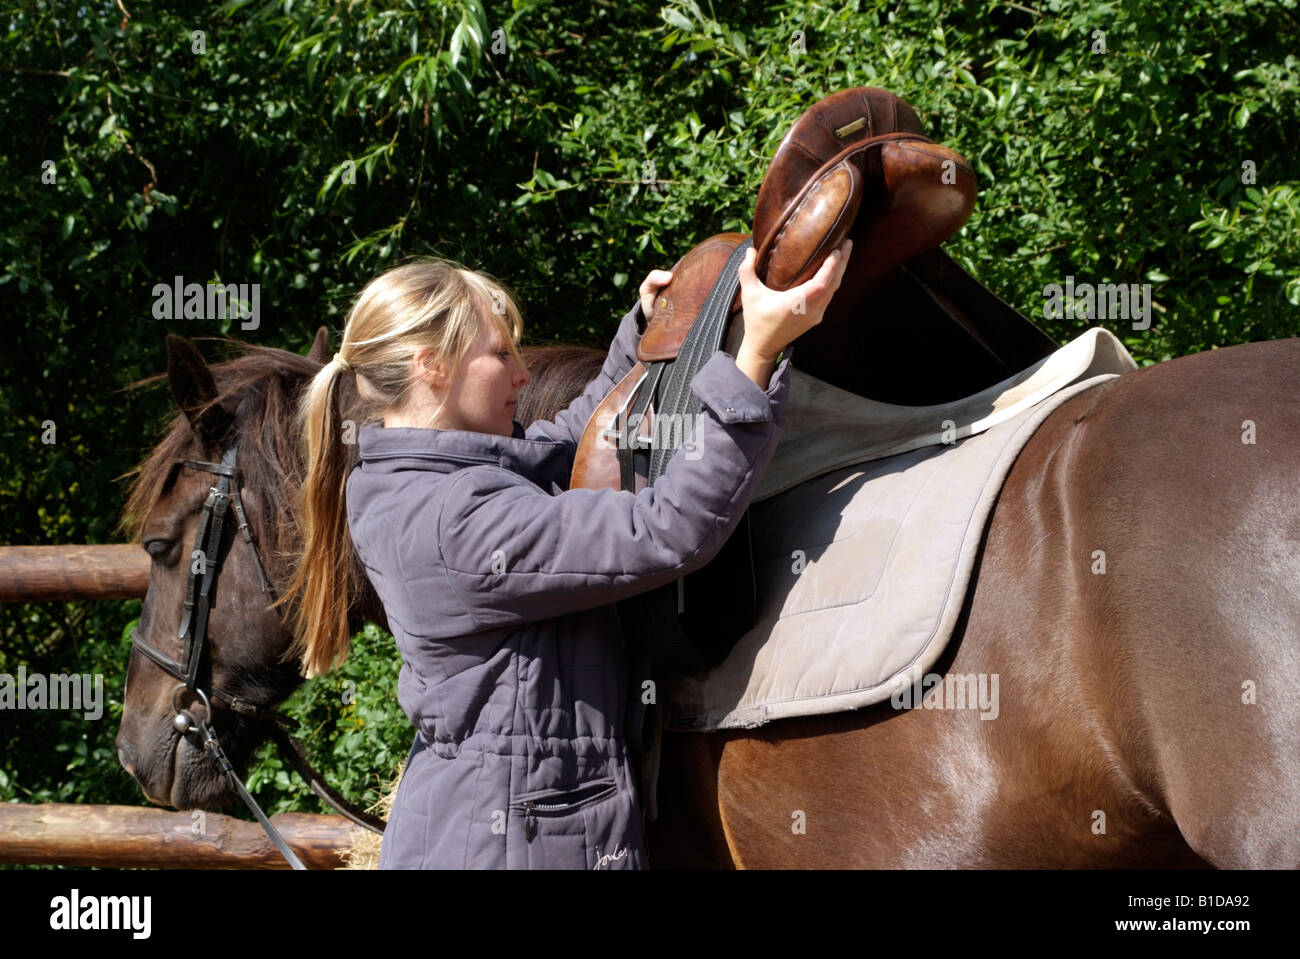 Woman placing saddle onto her pony Saddling her pet pony - Stock Image